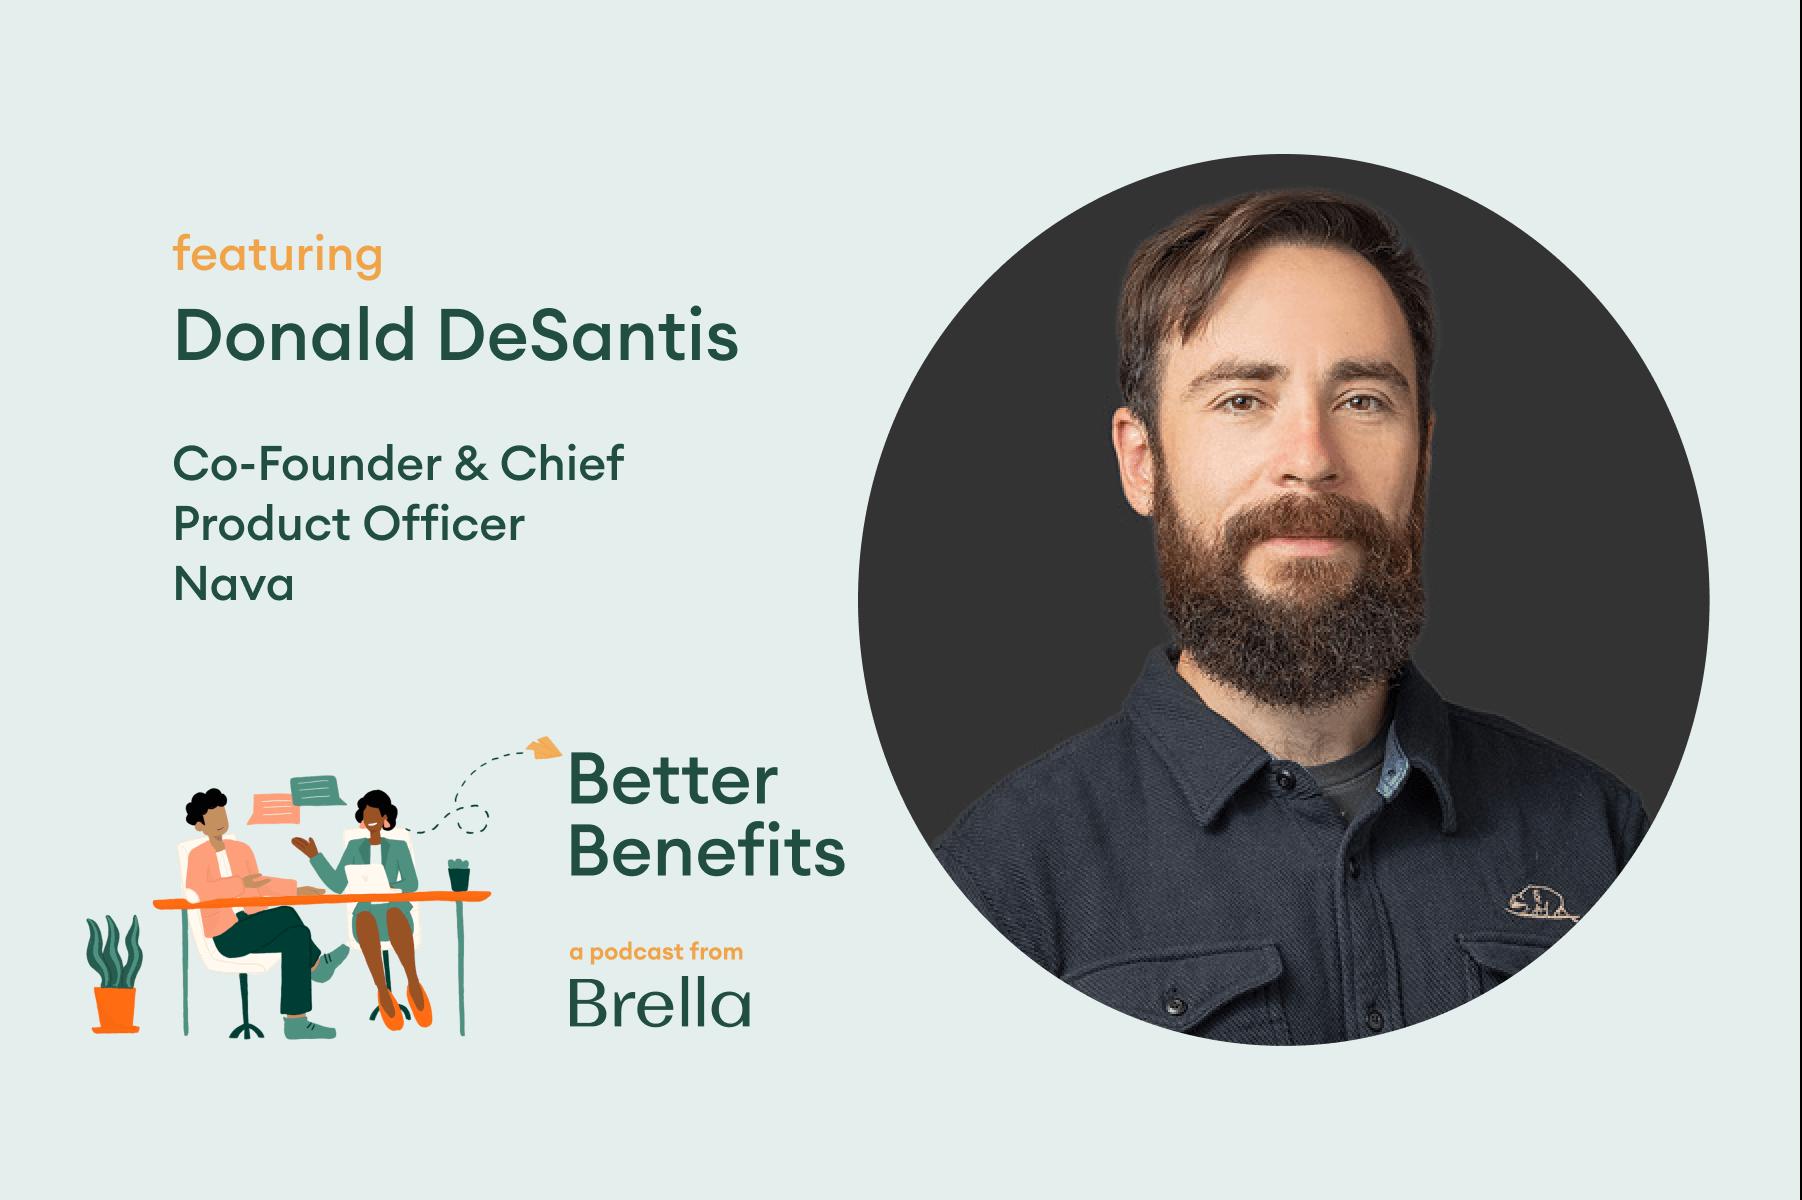 Donald DeSantis on Better Benefits | Brella